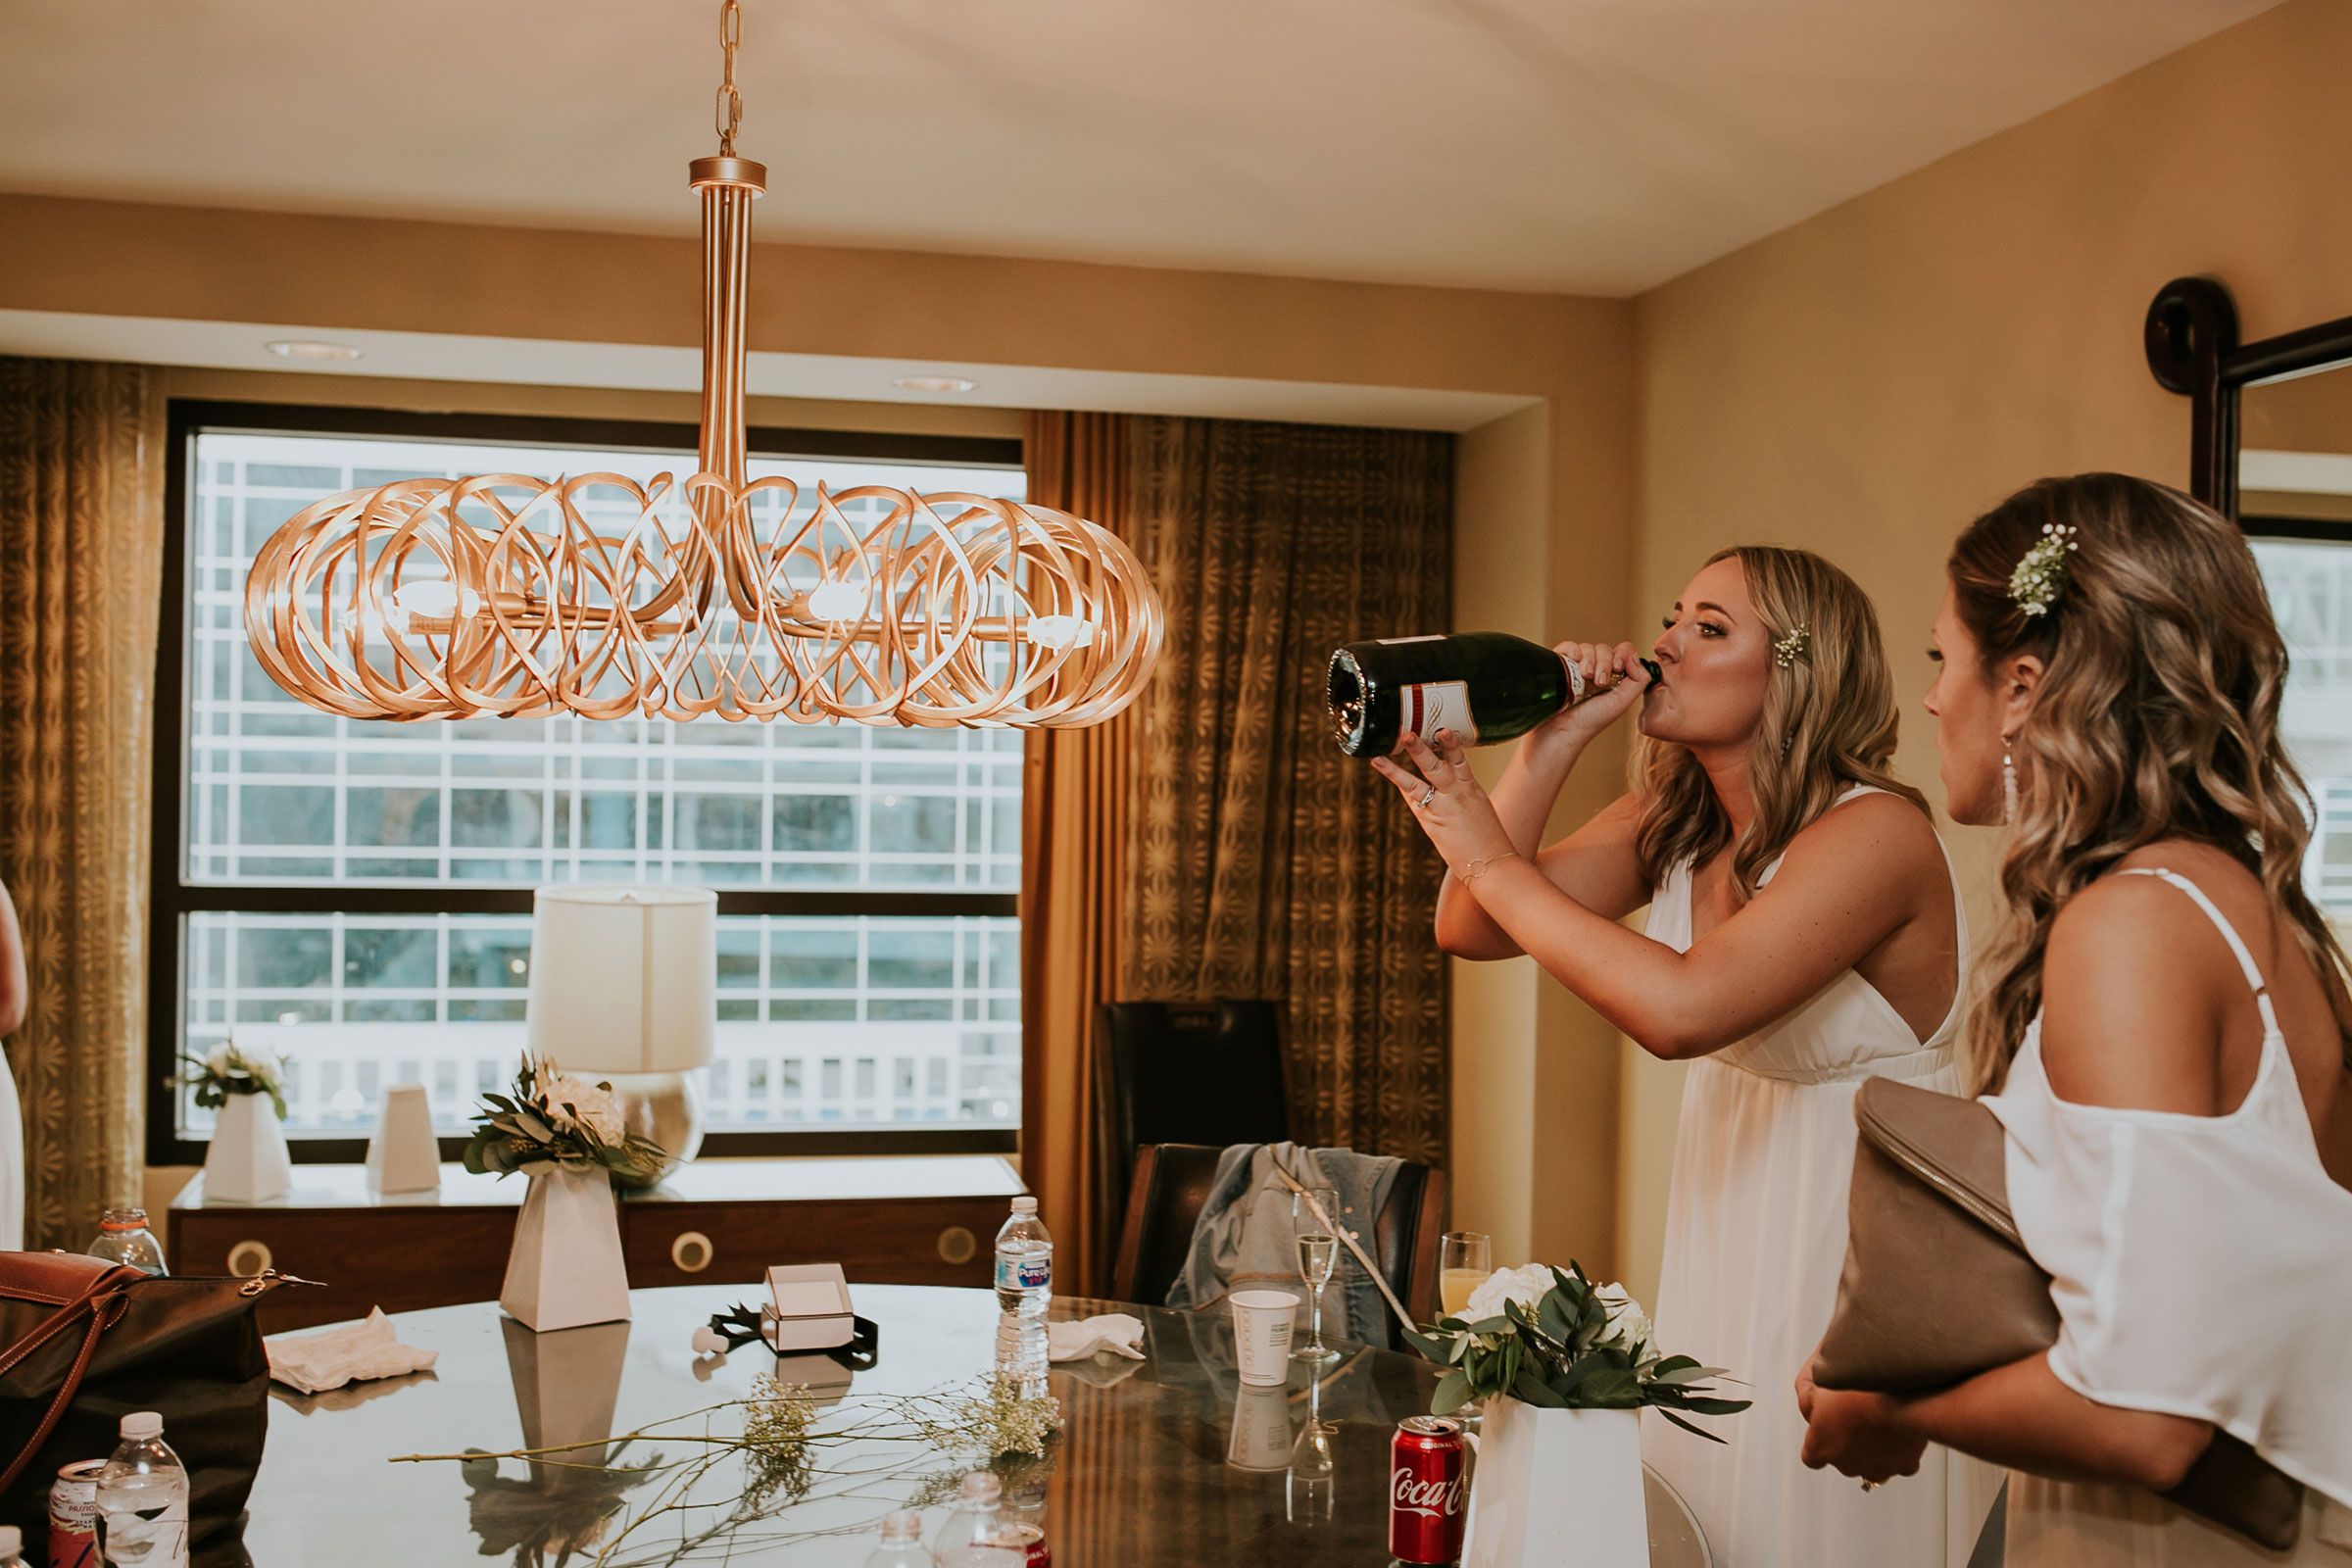 bridesmaid-chugging-champagne-hilton-omaha-nebraska-raelyn-ramey-photography.jpg